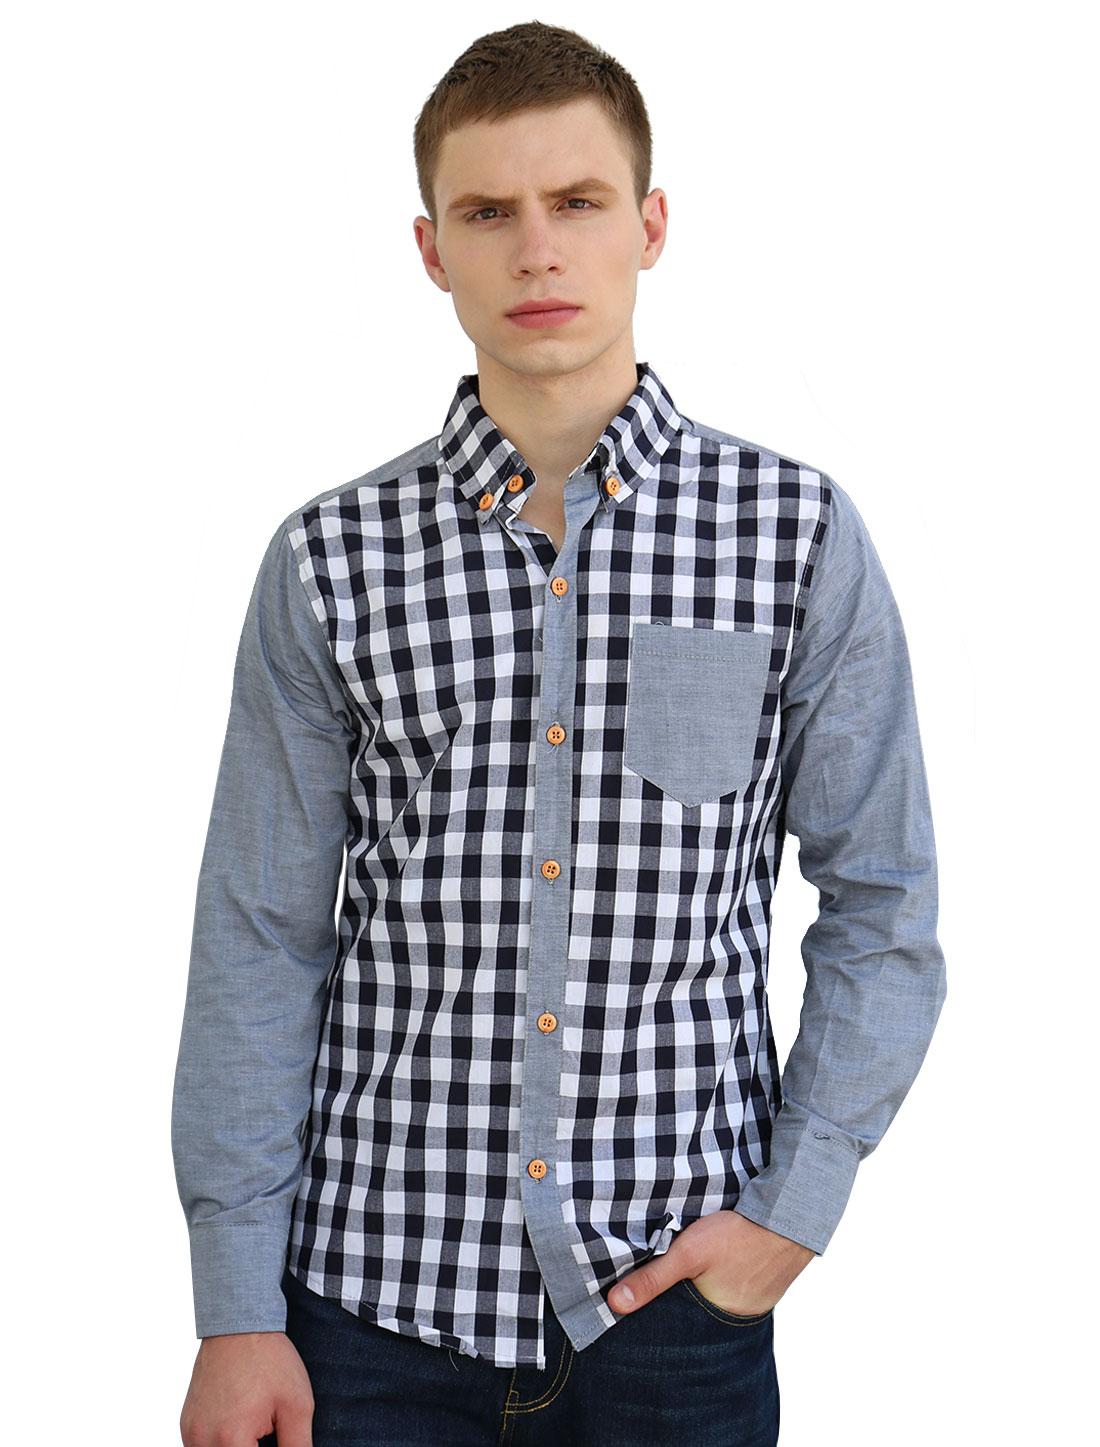 Men Button-Collar Single Breasted Long Sleeve Plaid Shirt Light Gray S